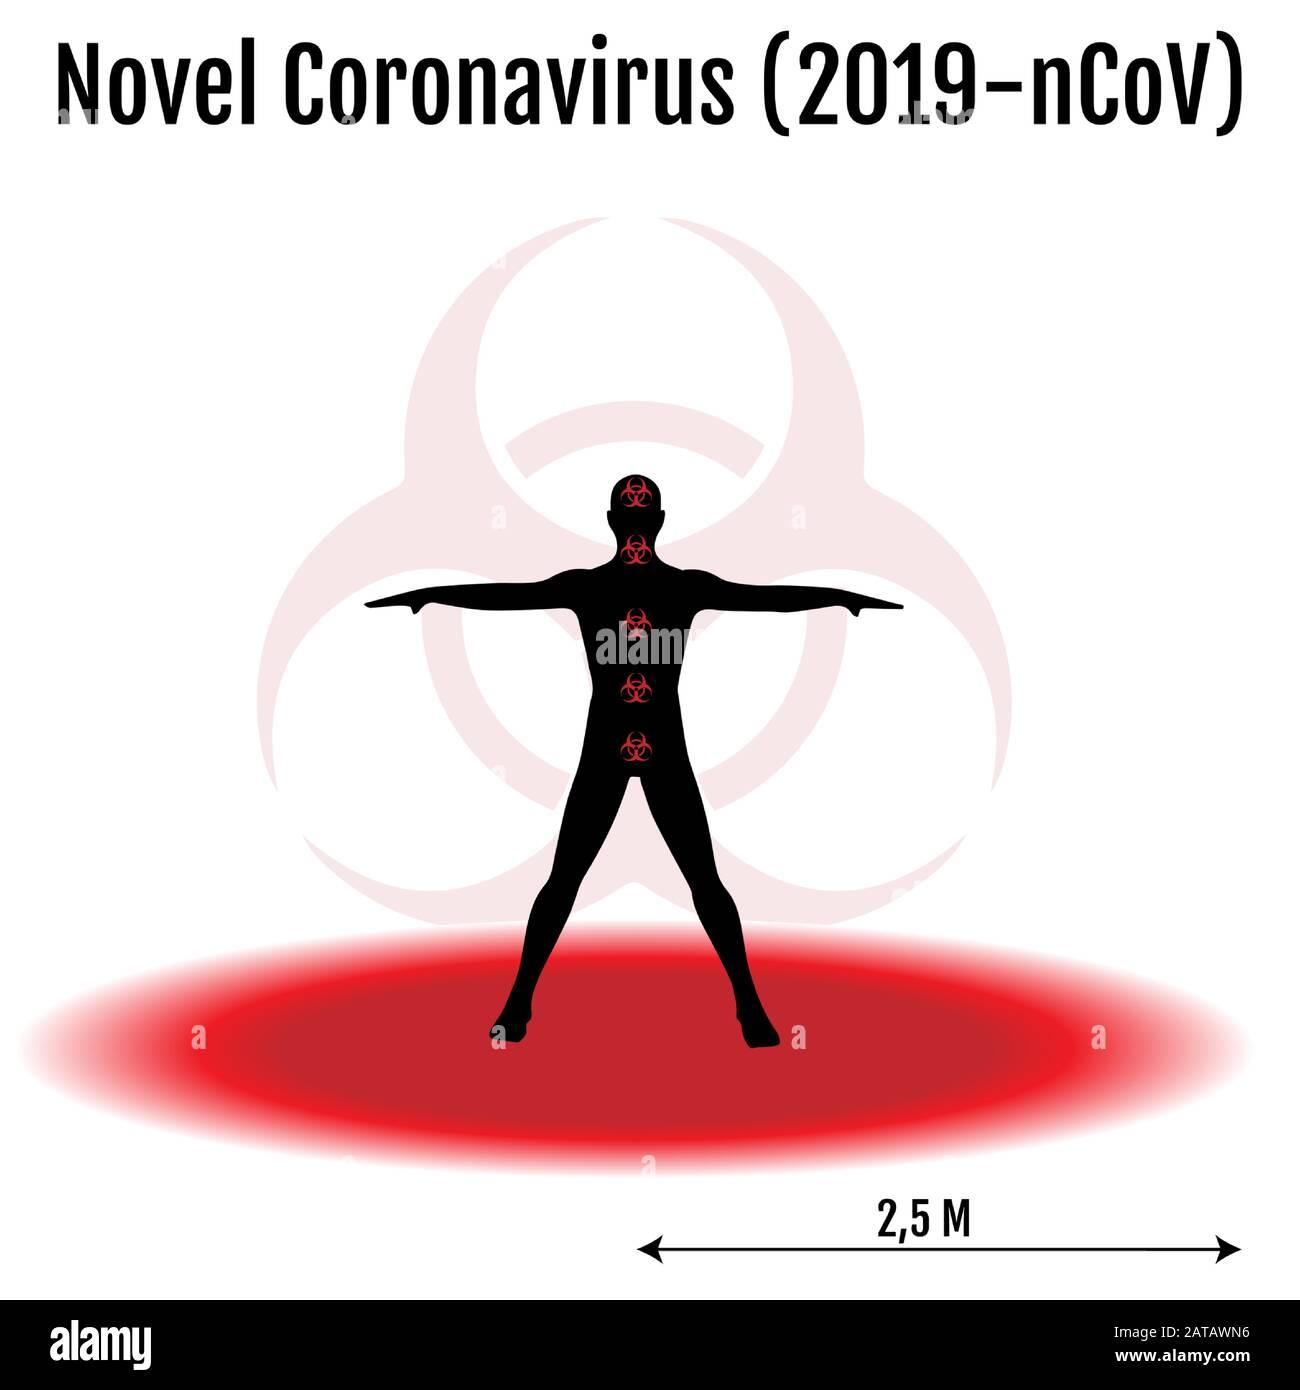 Novel coronavirus 2019-nCoV infographic template Stock Vector